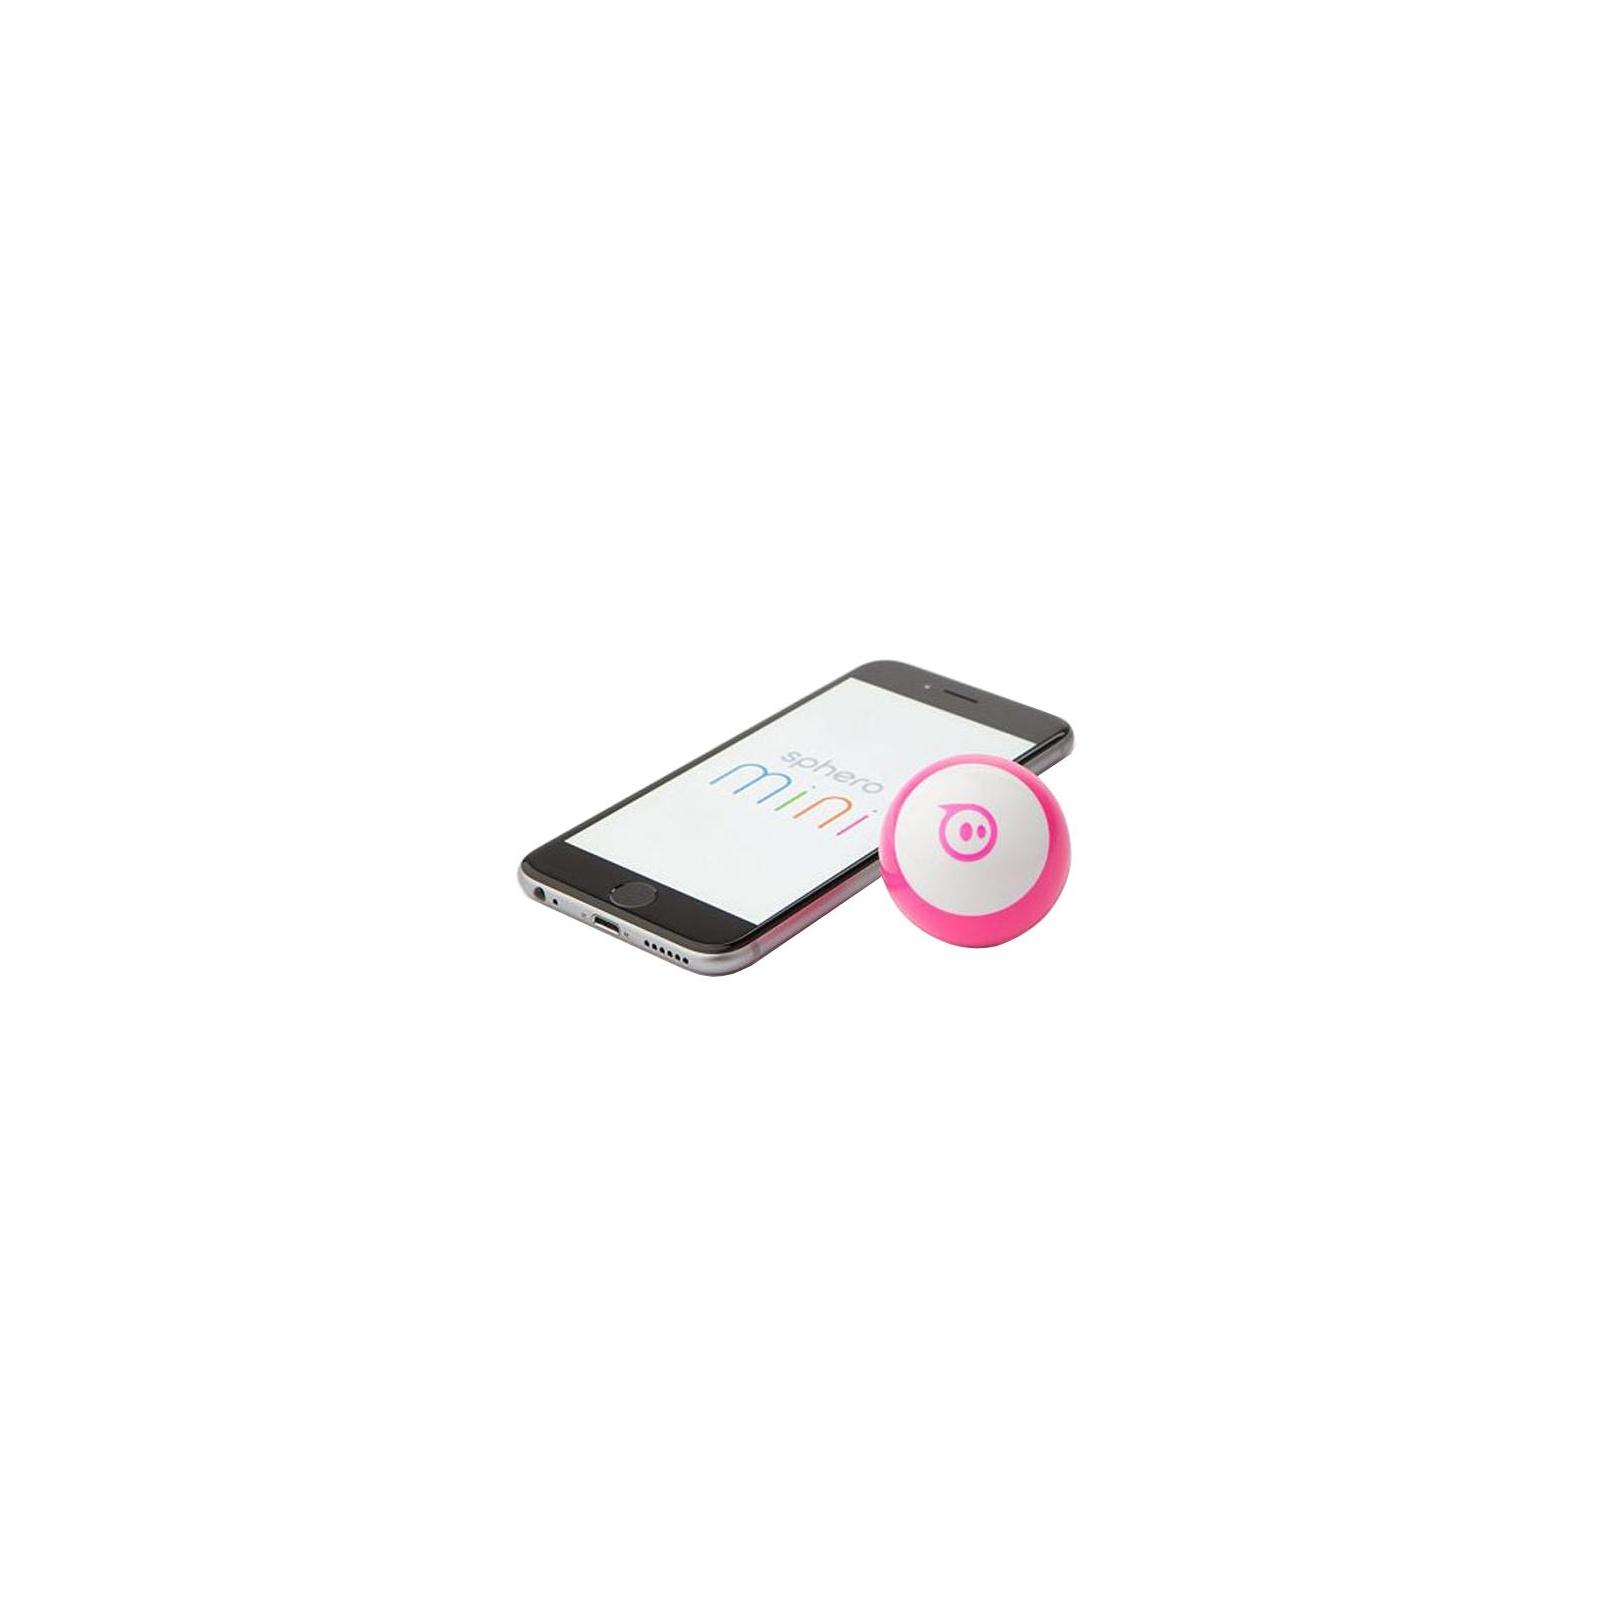 Робот Sphero Mini Pink (322662) изображение 2